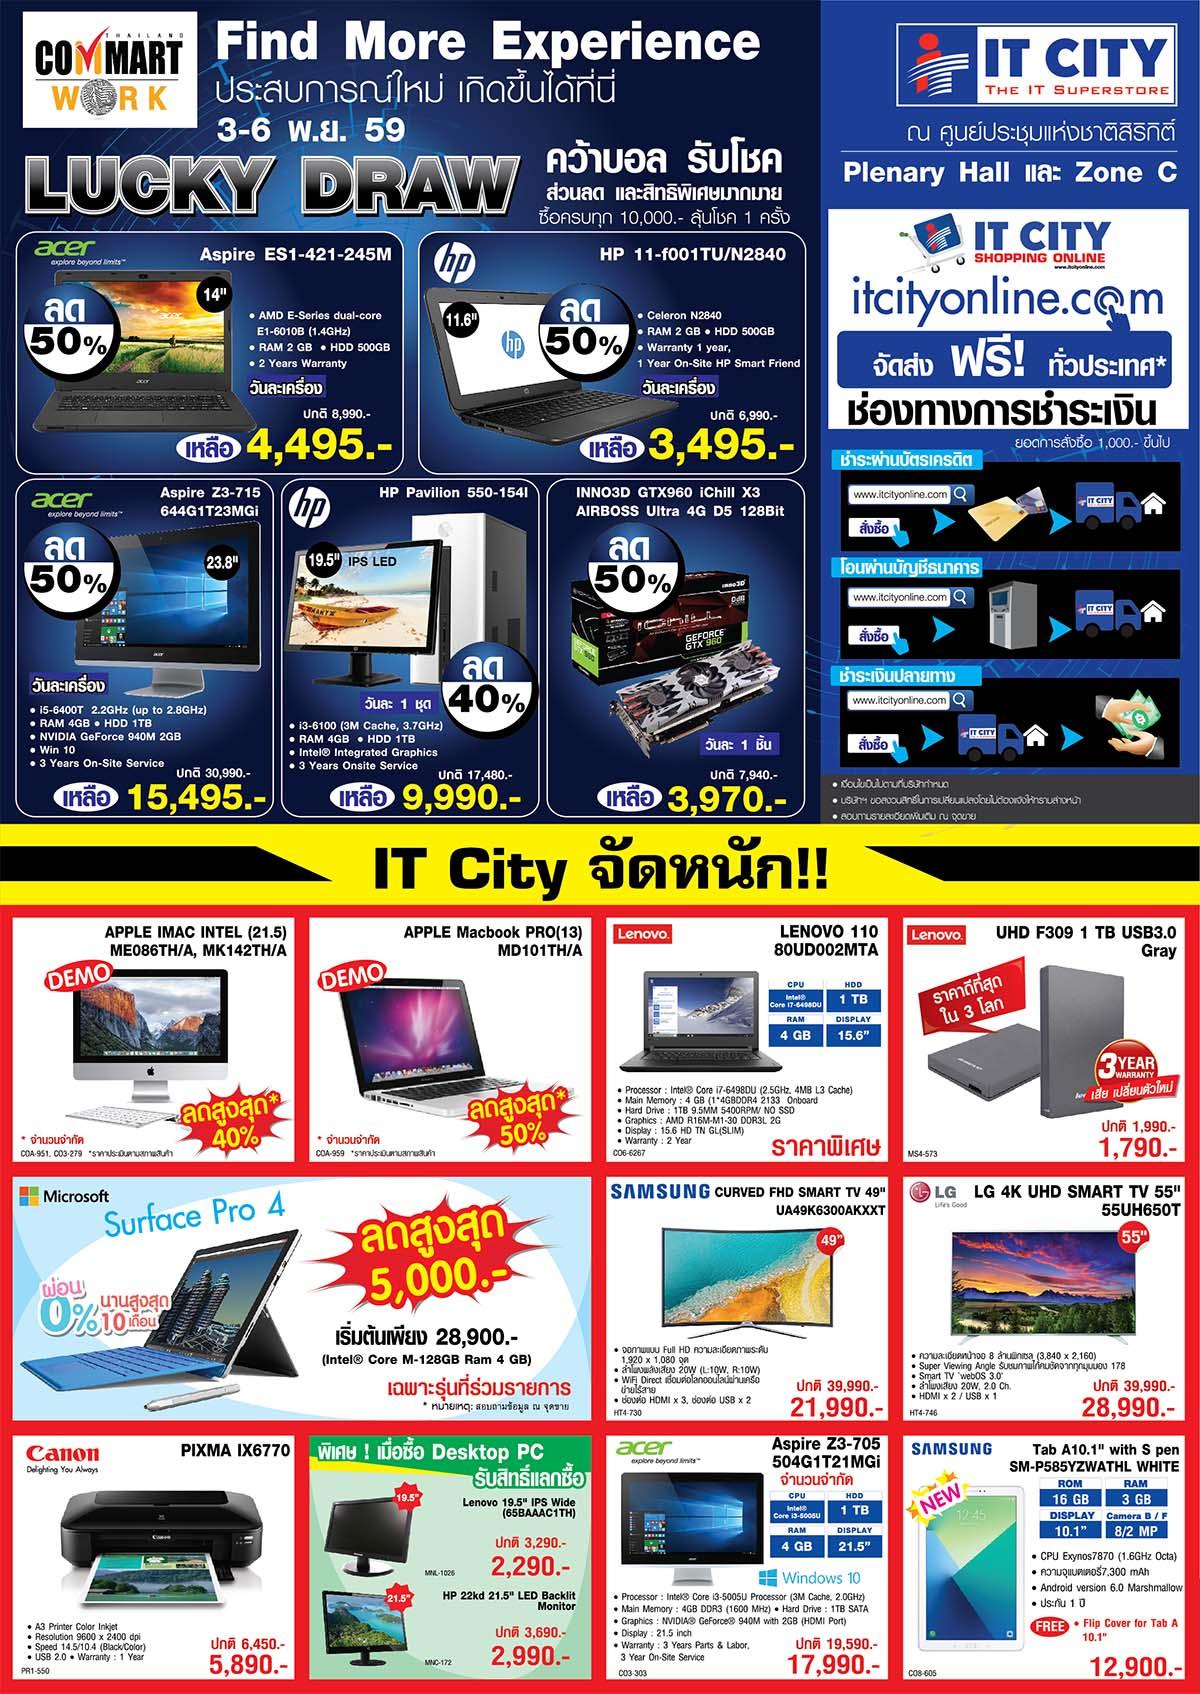 it-city-commart-work-3-6-november-2016-1